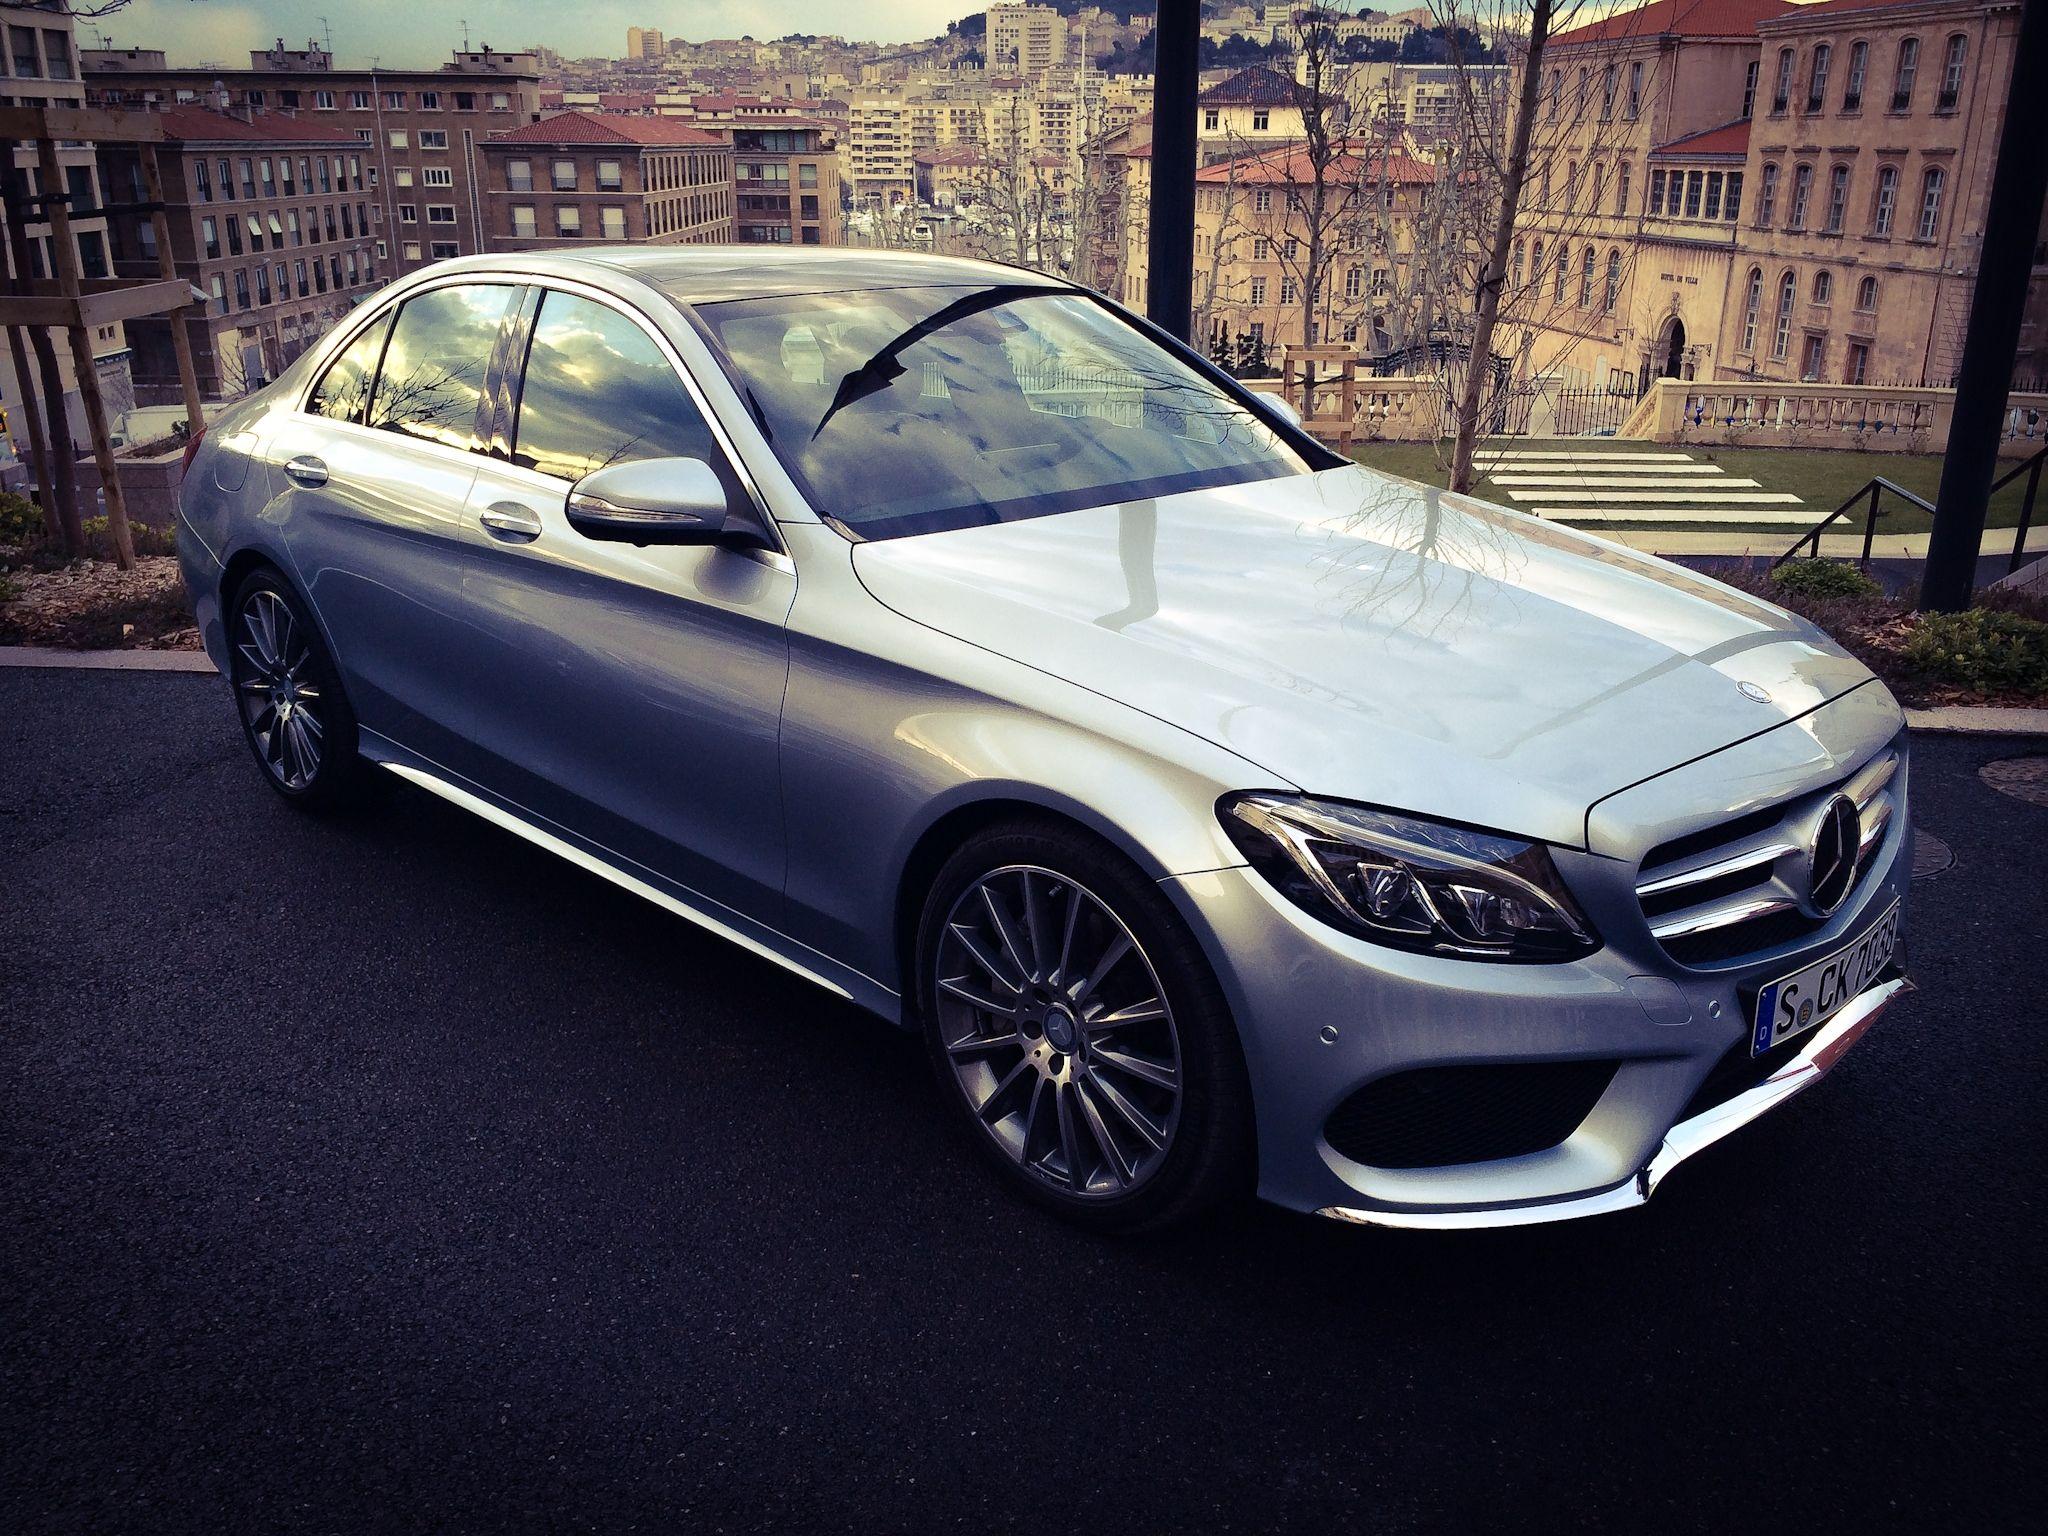 2014 Mercedes-Benz C-class - Car and Driver